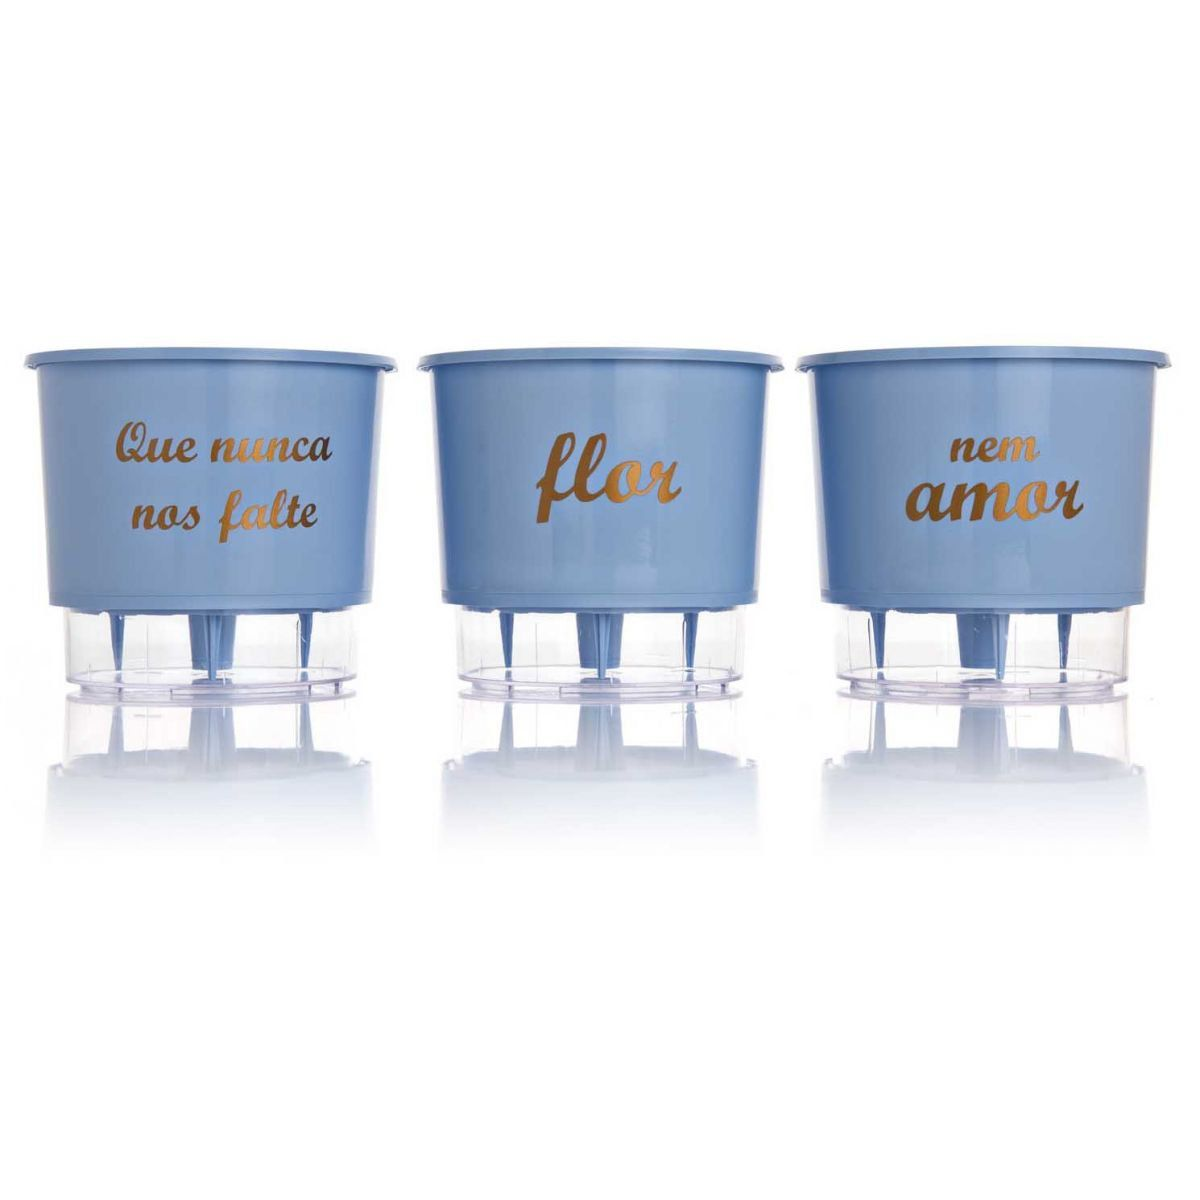 Kit 3 Vasos Autoirrigáveis Pequenos N02 12 cm x 11 cm Flor e Amor Azul Serenity